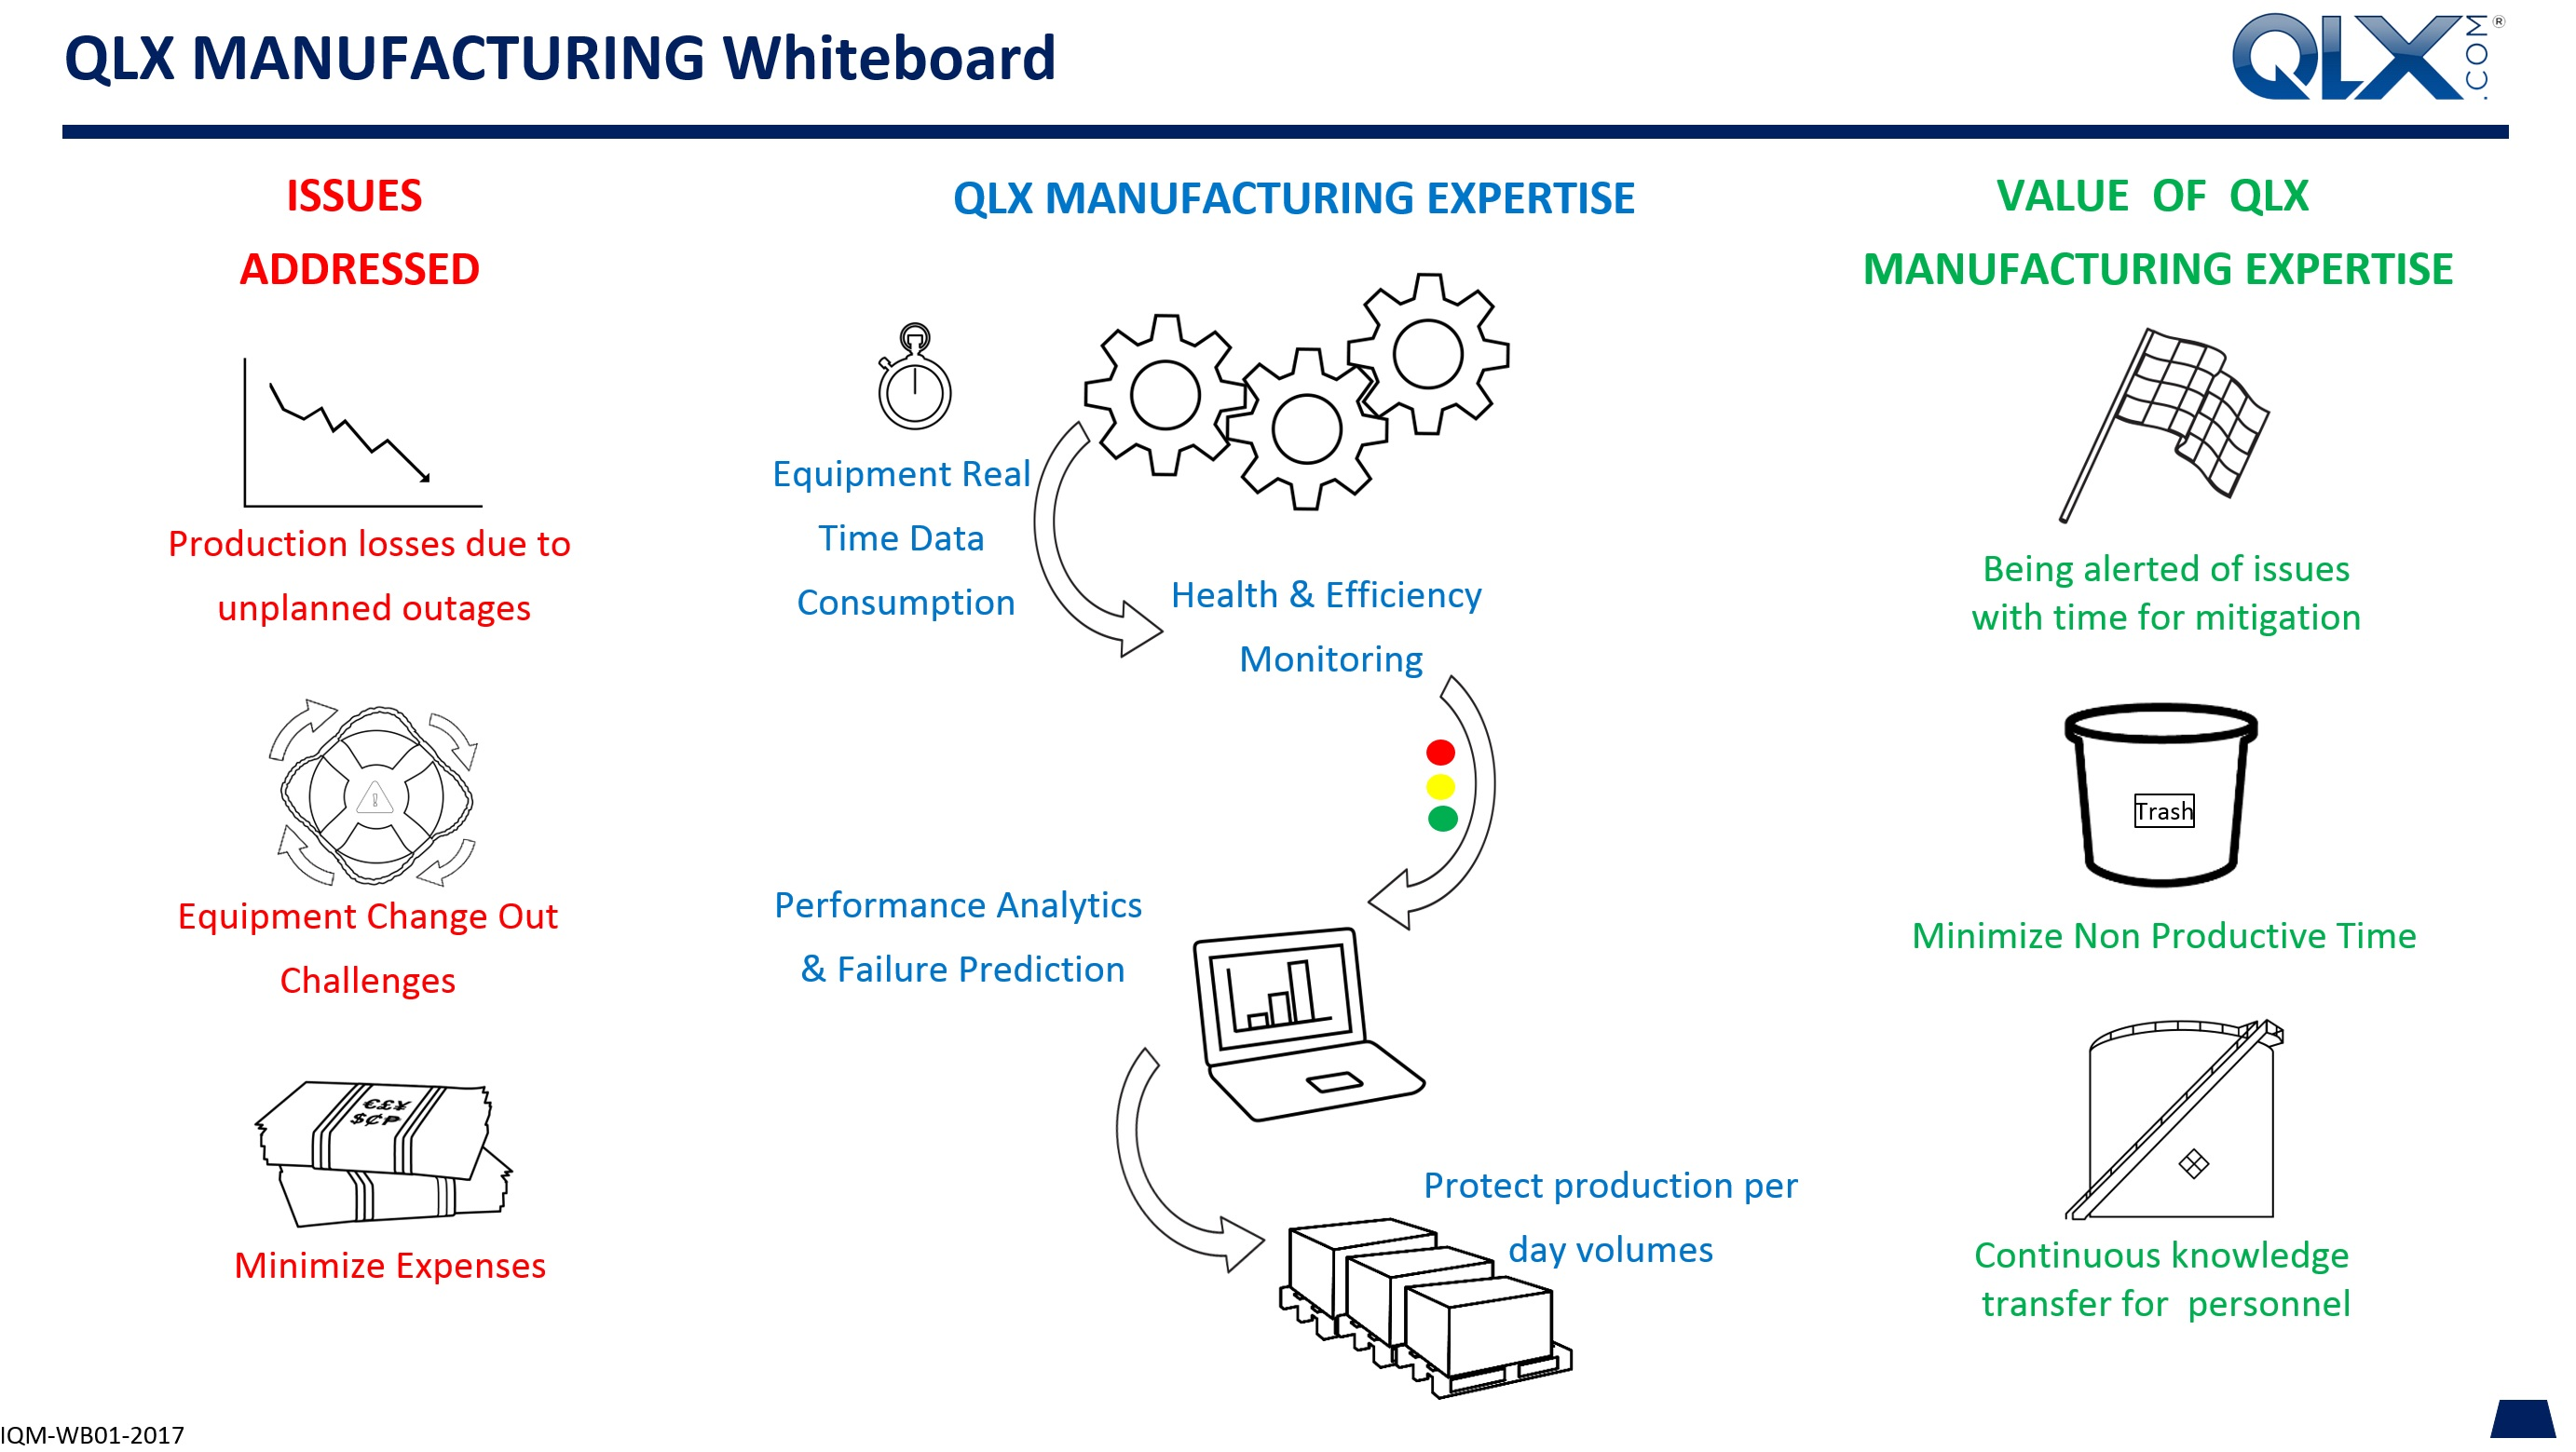 QLX Whiteboard Manufacturing